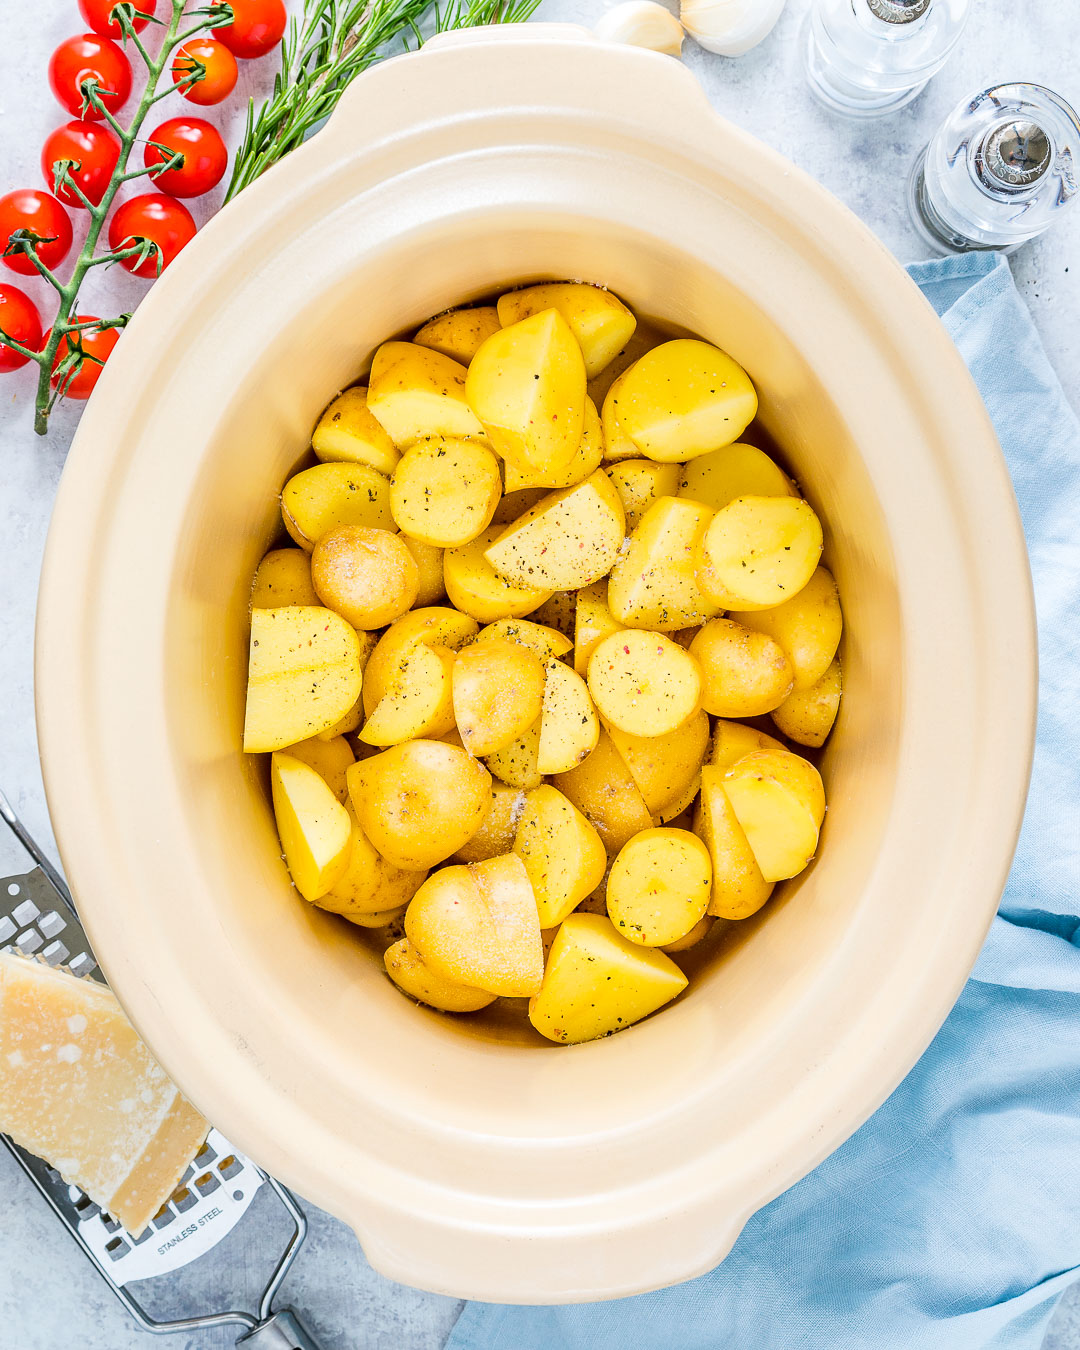 Meal Prep New Potatoes Step 1